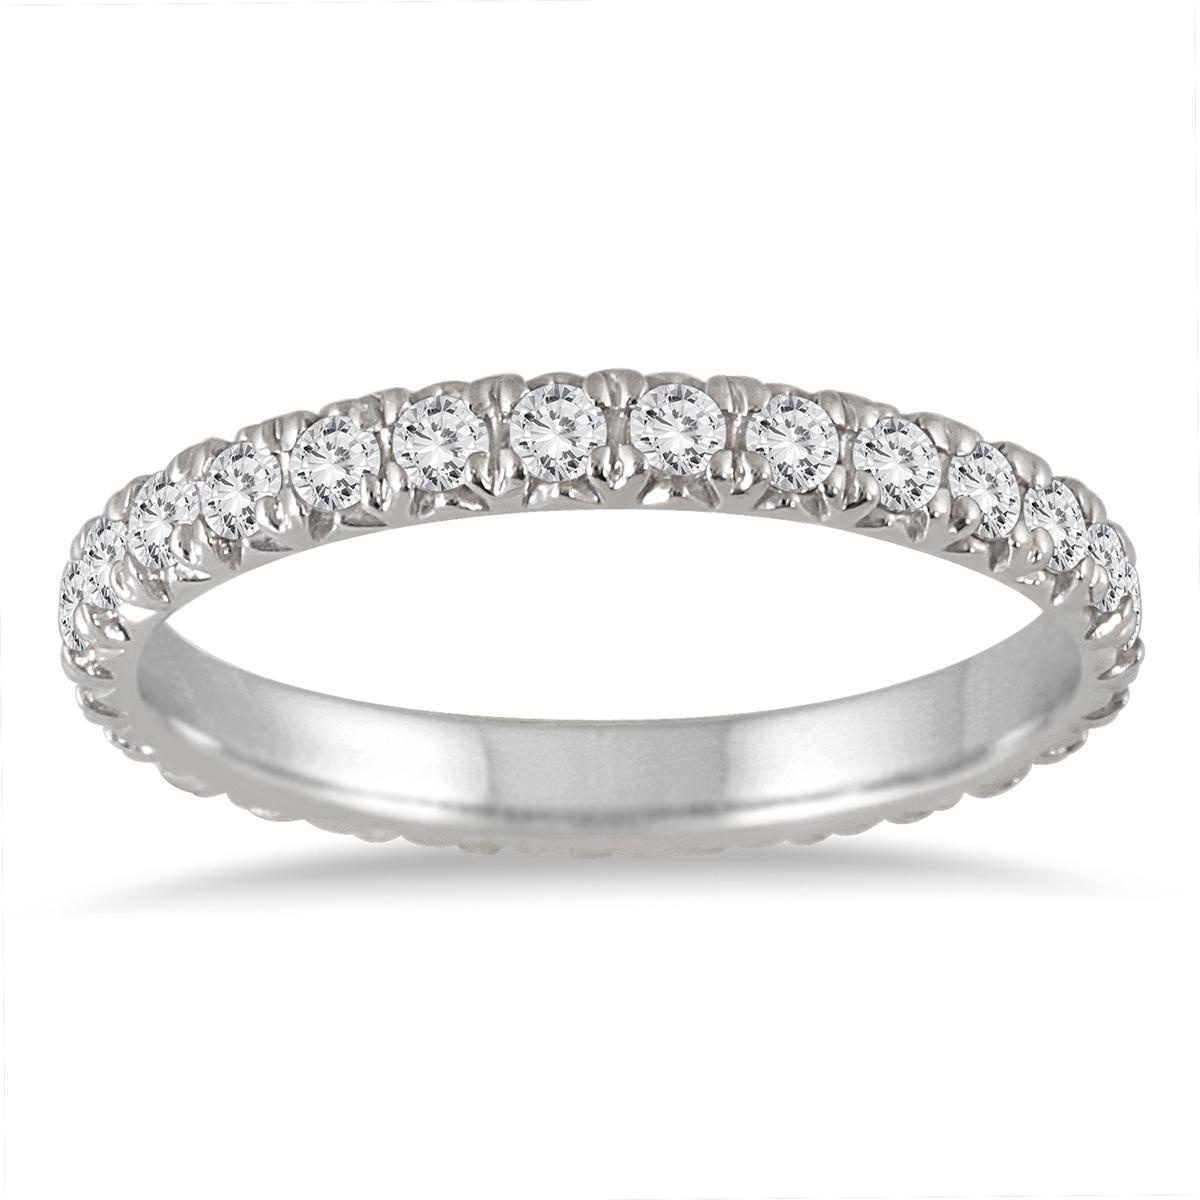 1 3/8 Carat TW Diamond Eternity Wedding Band in 14K White Gold